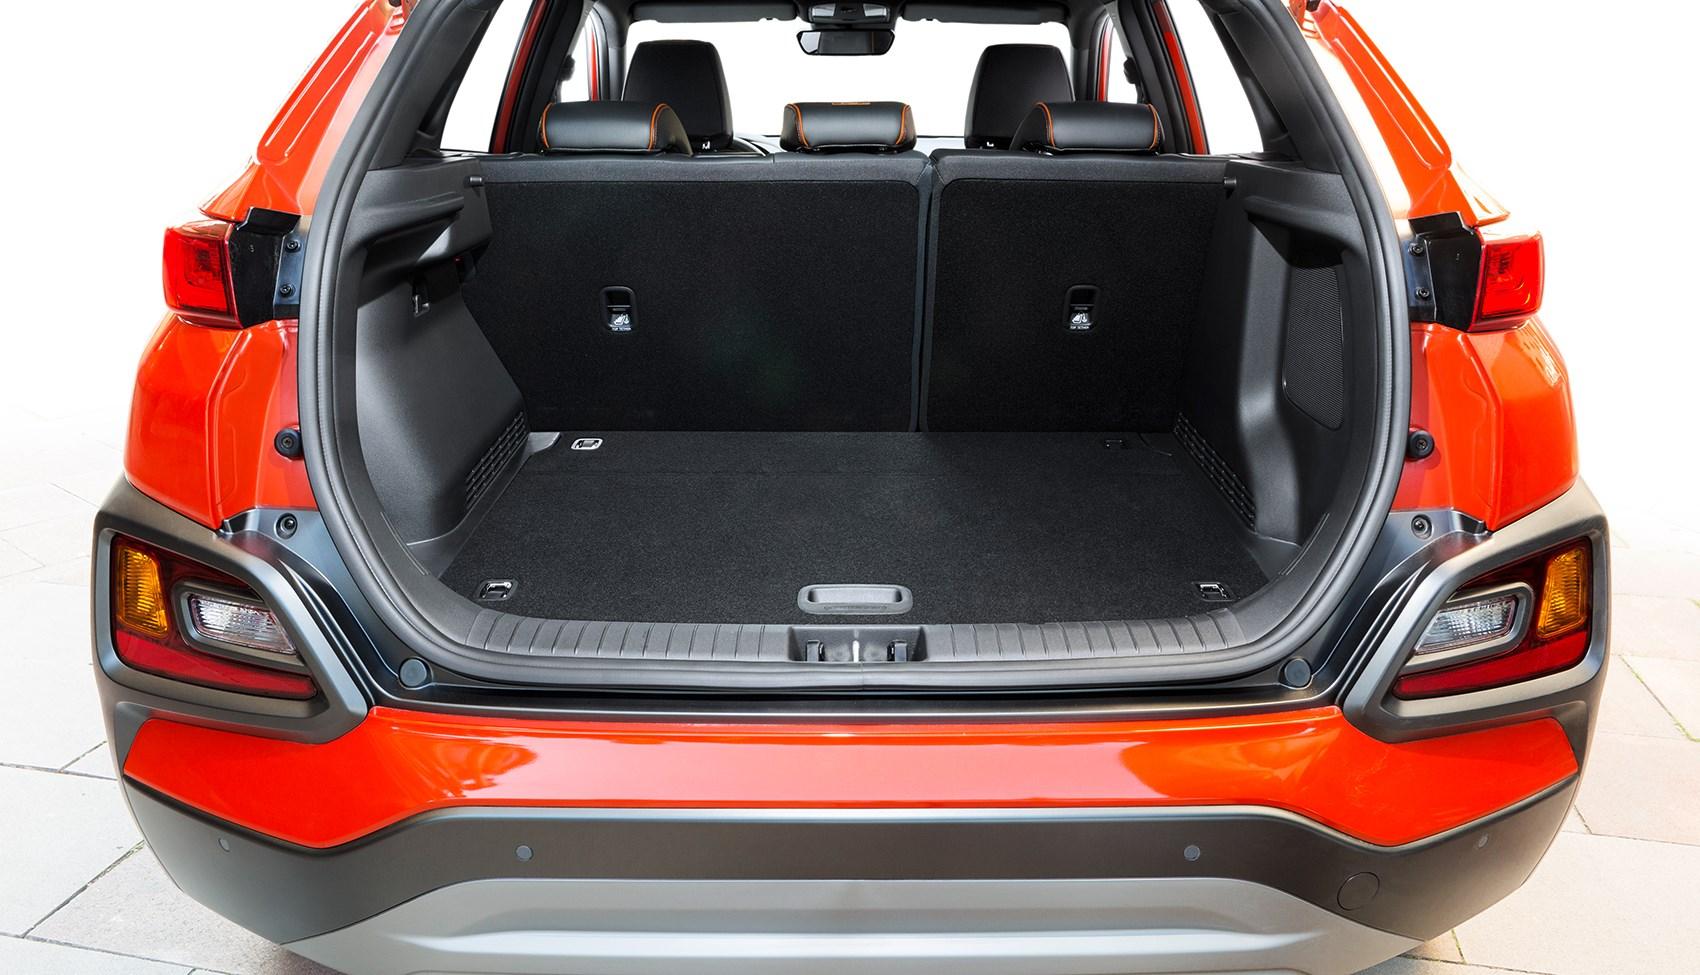 Hyundai Kona SUV (2017) review | CAR Magazine